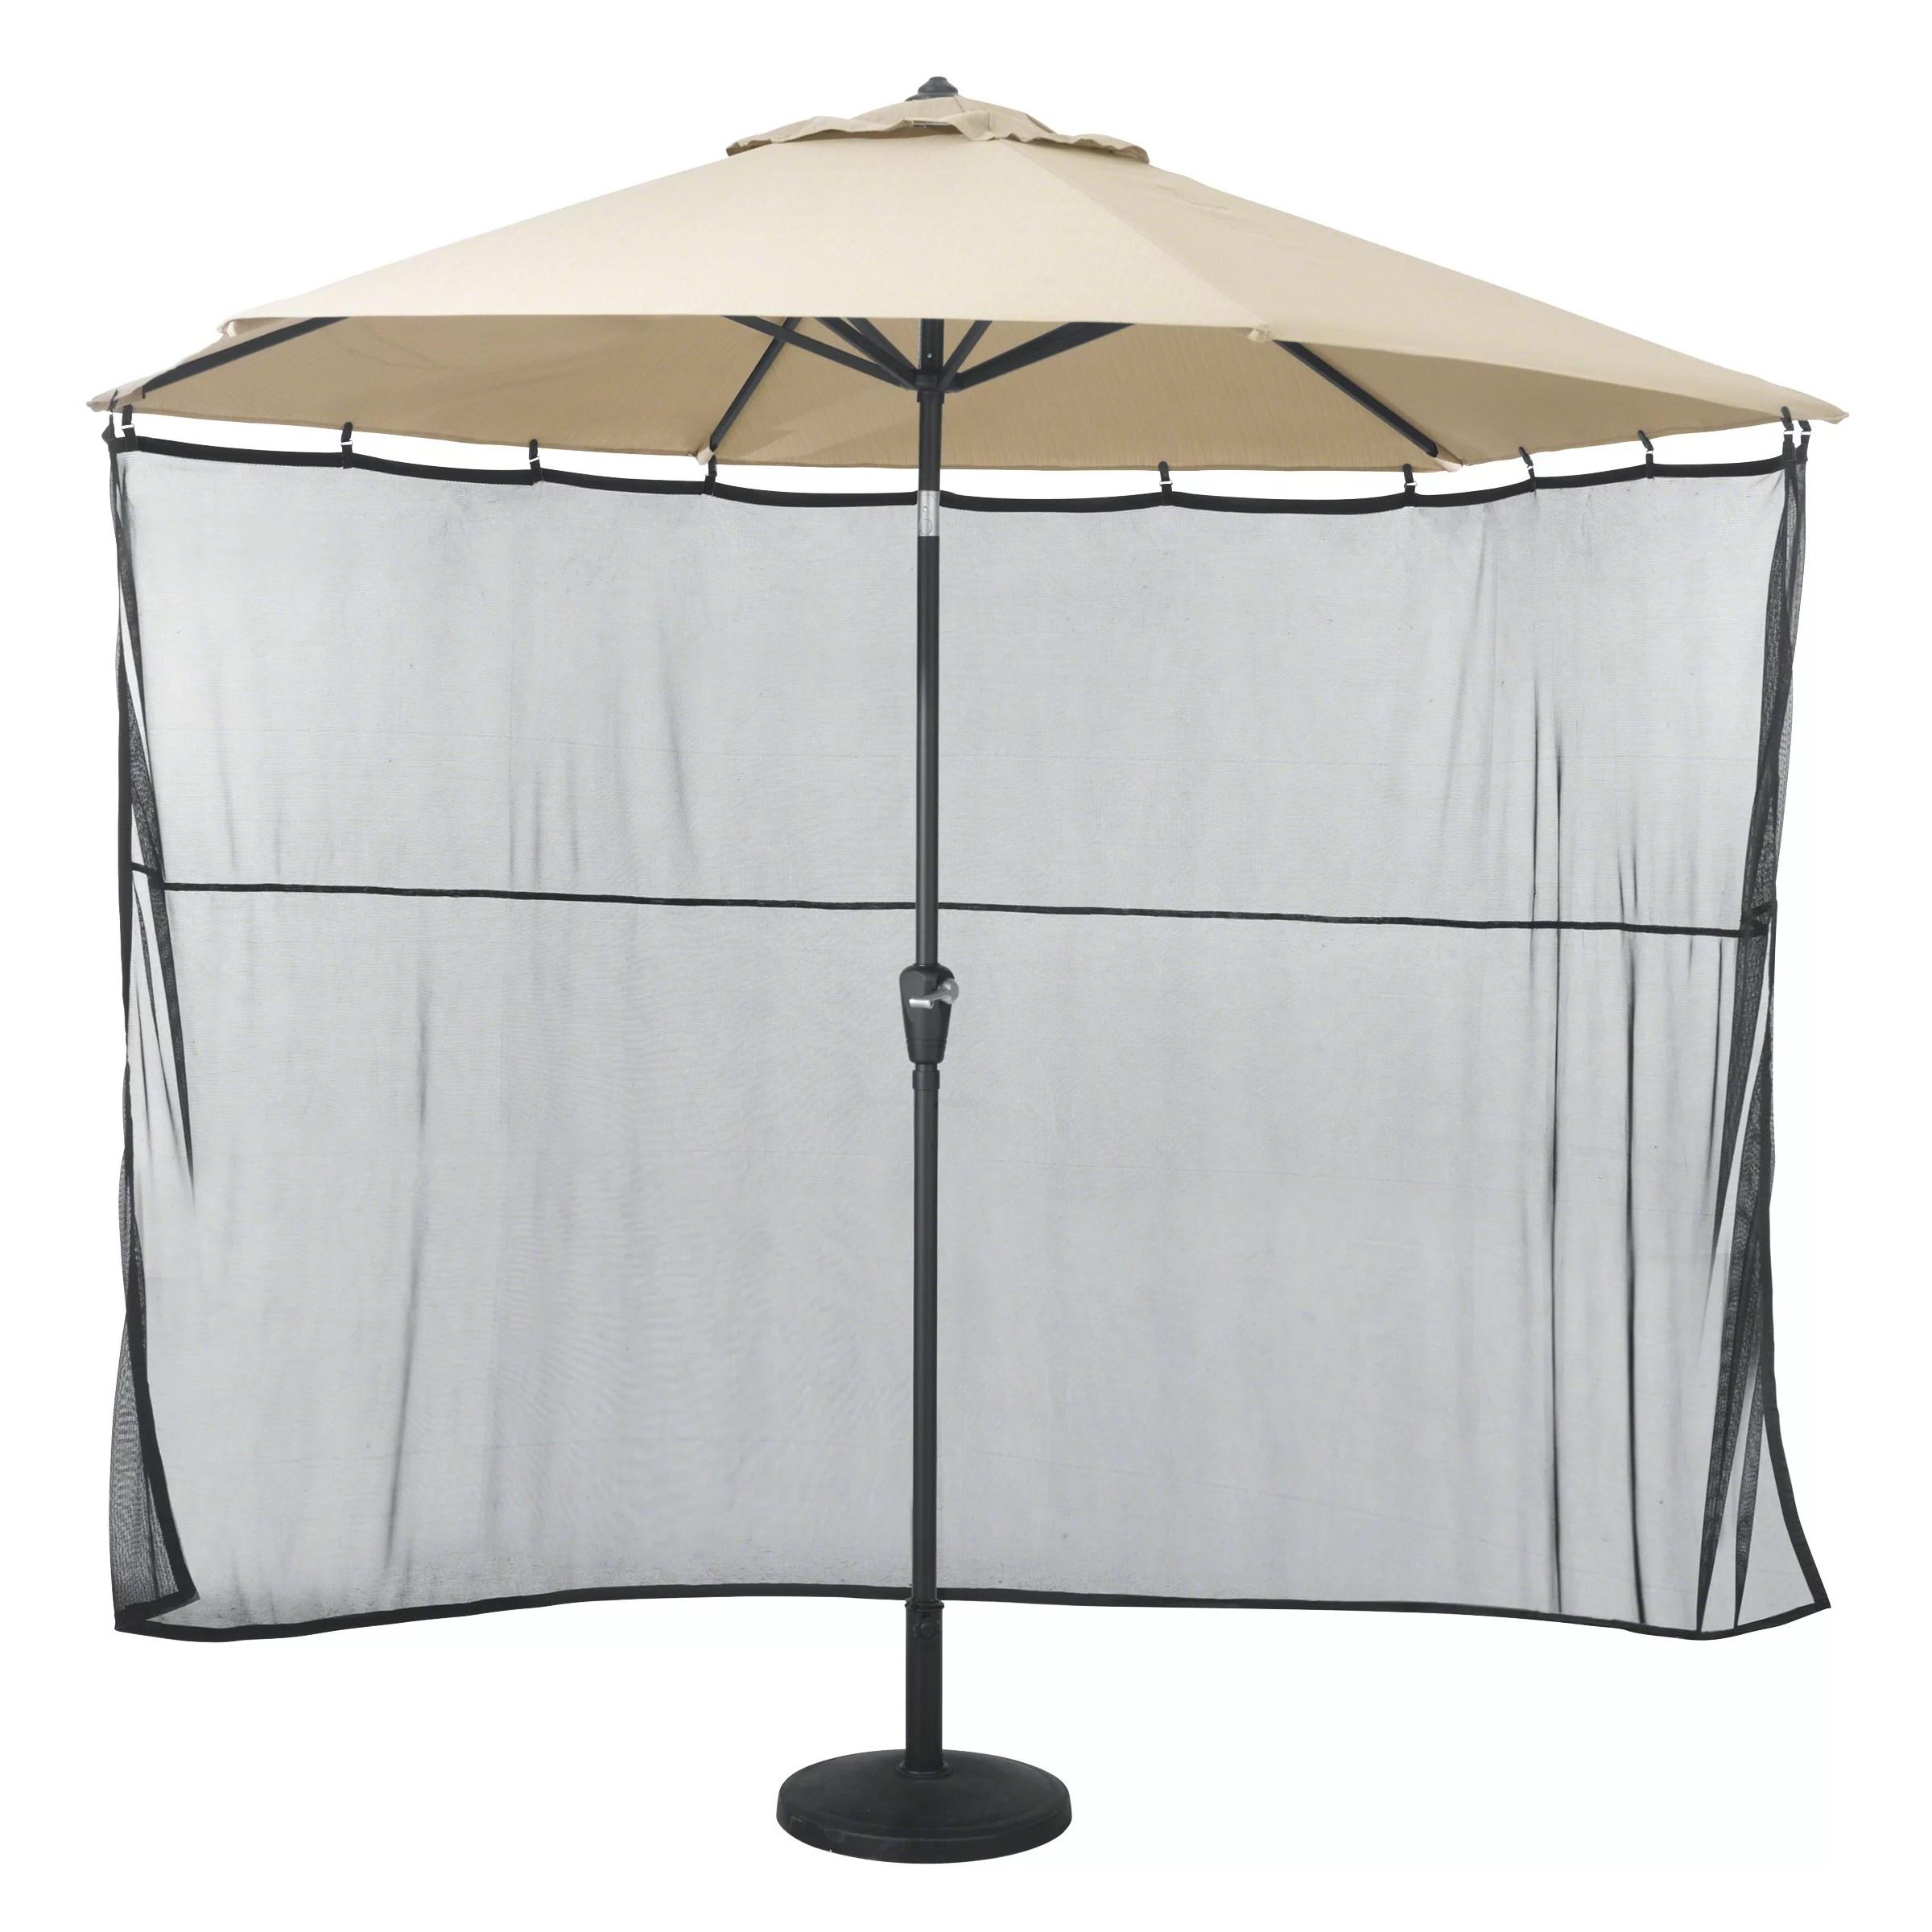 arlmont co pereira water resistant patio umbrella side wall sun shade netting reviews wayfair